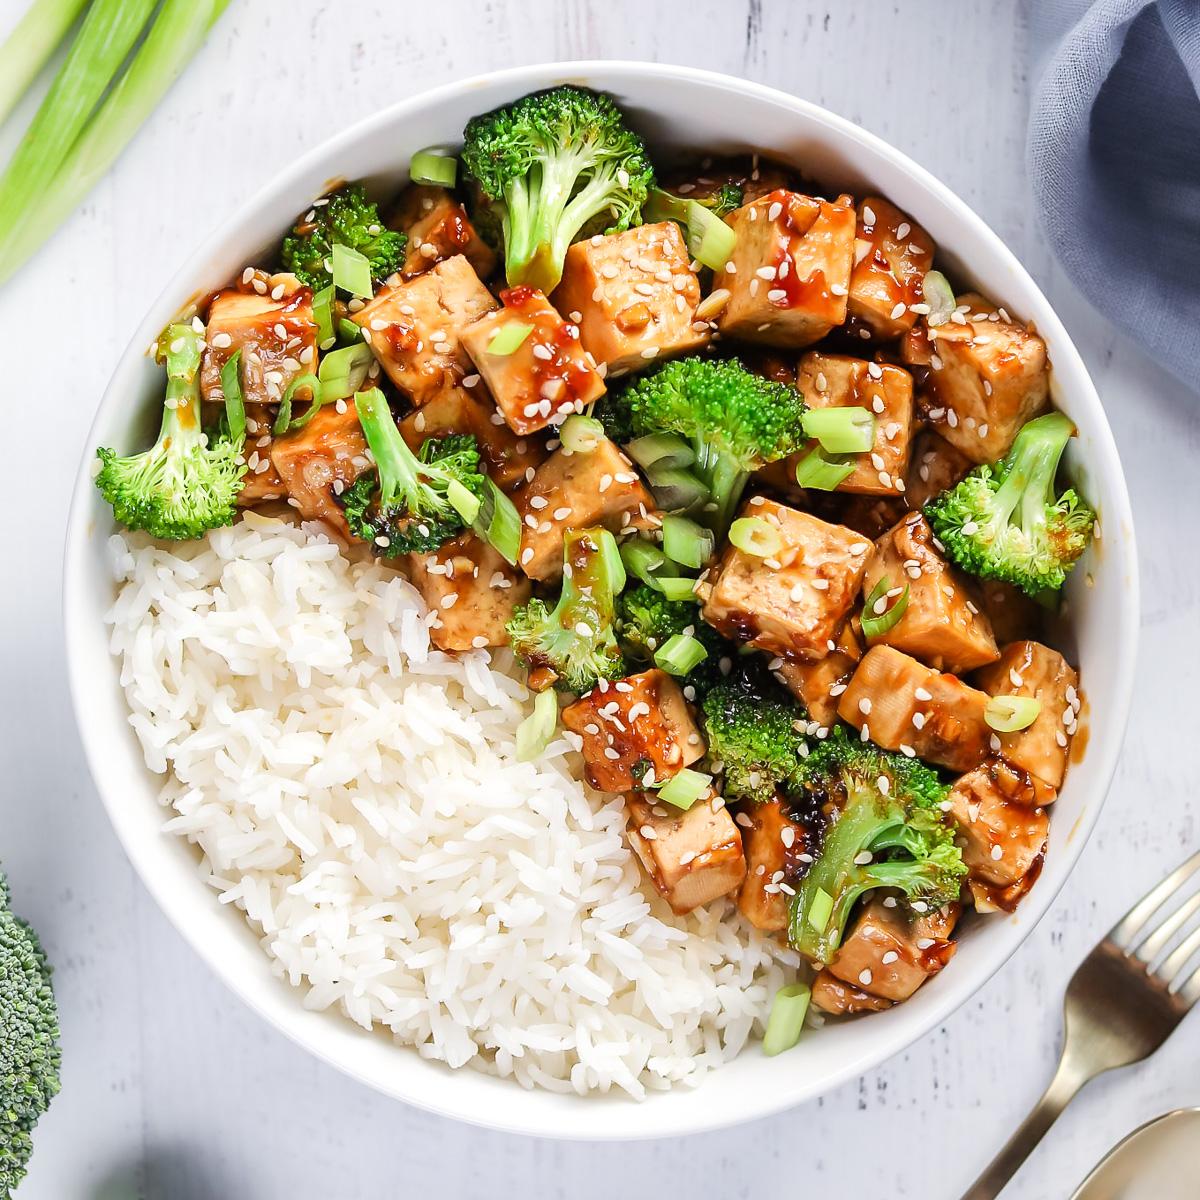 teriyaki tofu stir fry